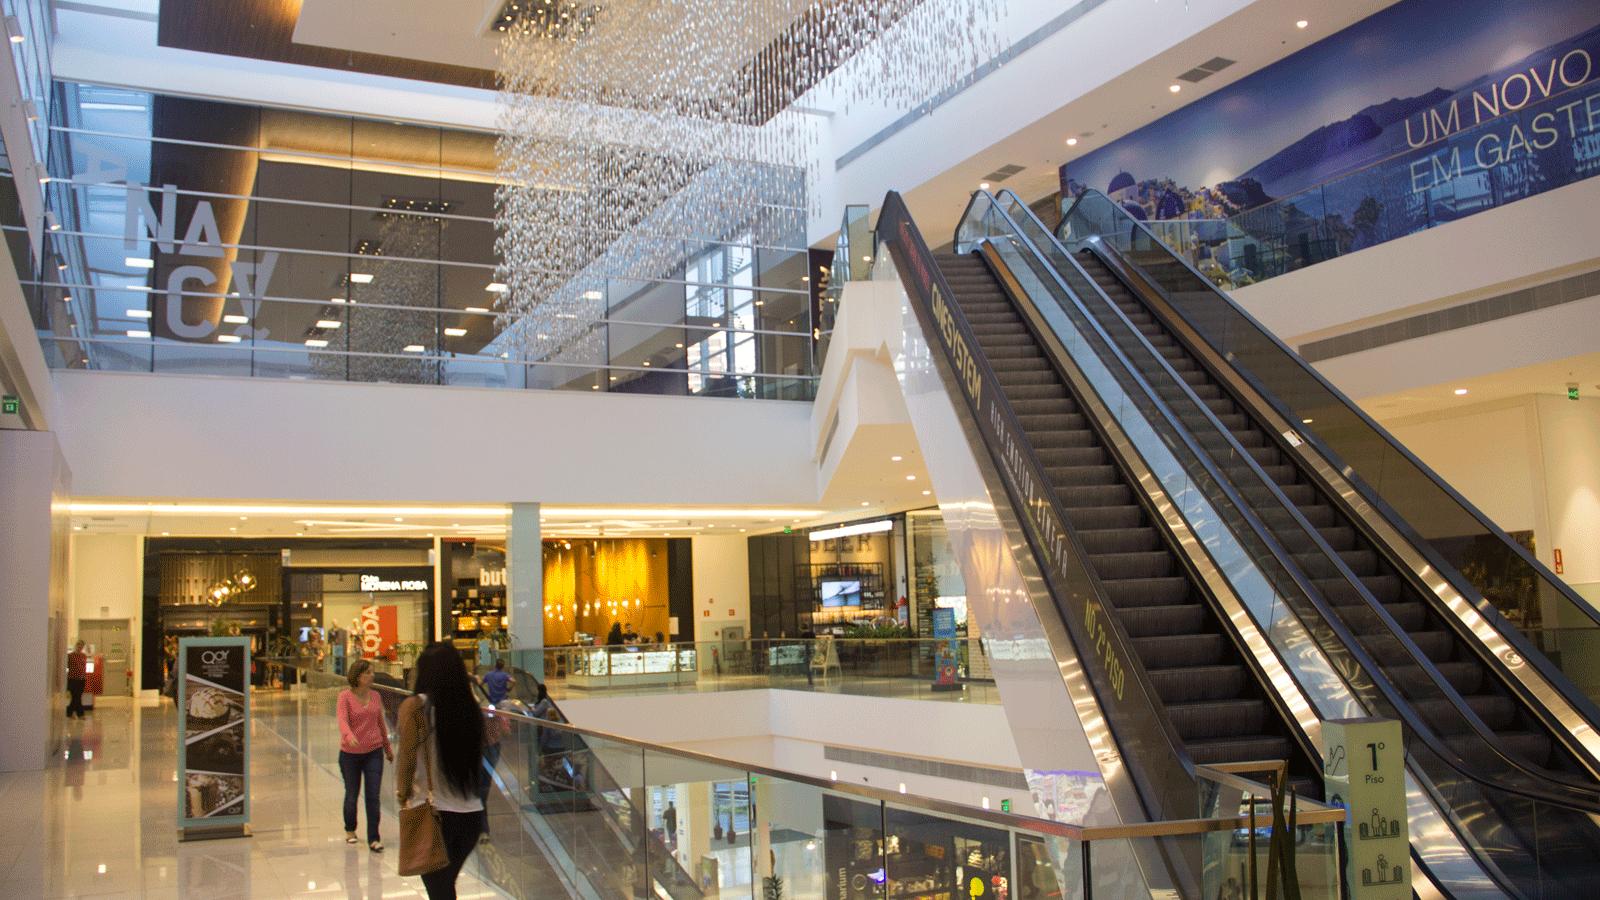 09442be560 Shopping-Morumbi-Town-06 – Lopes Dias Arquitetura